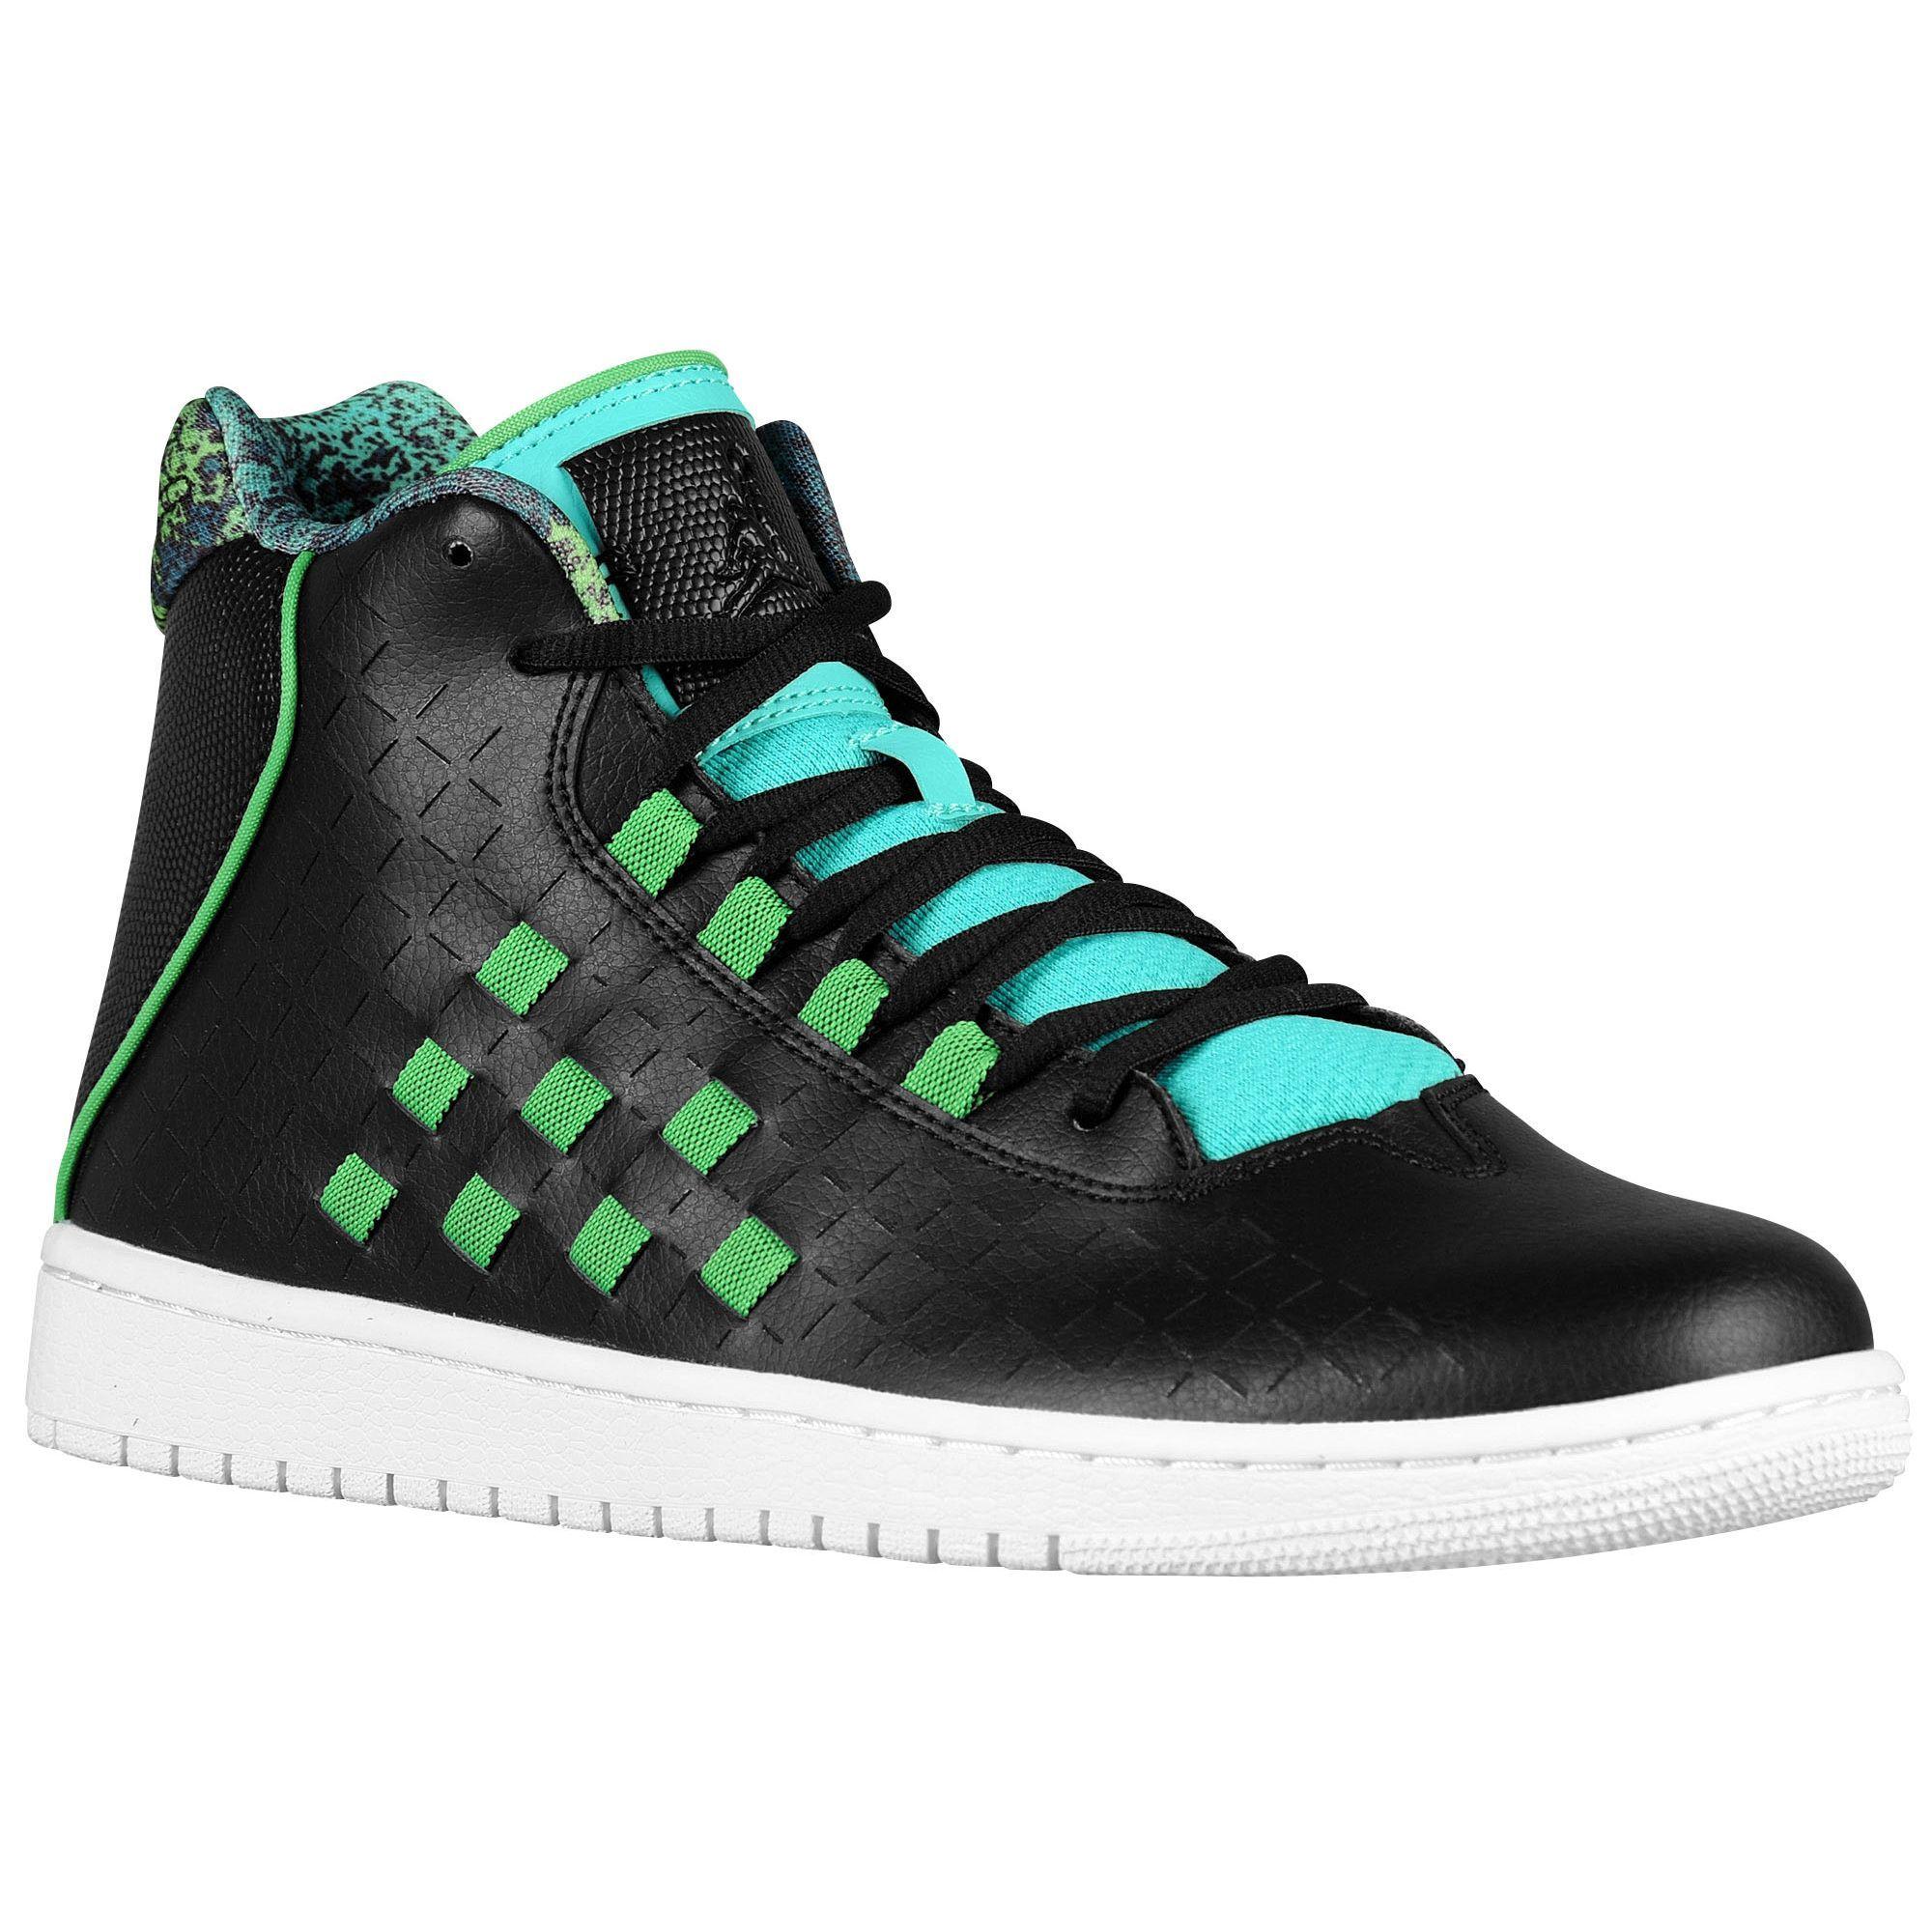 c5cb75ee9e4a 台灣未發售的潮流籃球鞋款:Jordan Illusion - Men s - Basketball - Shoes -  White White French Blue